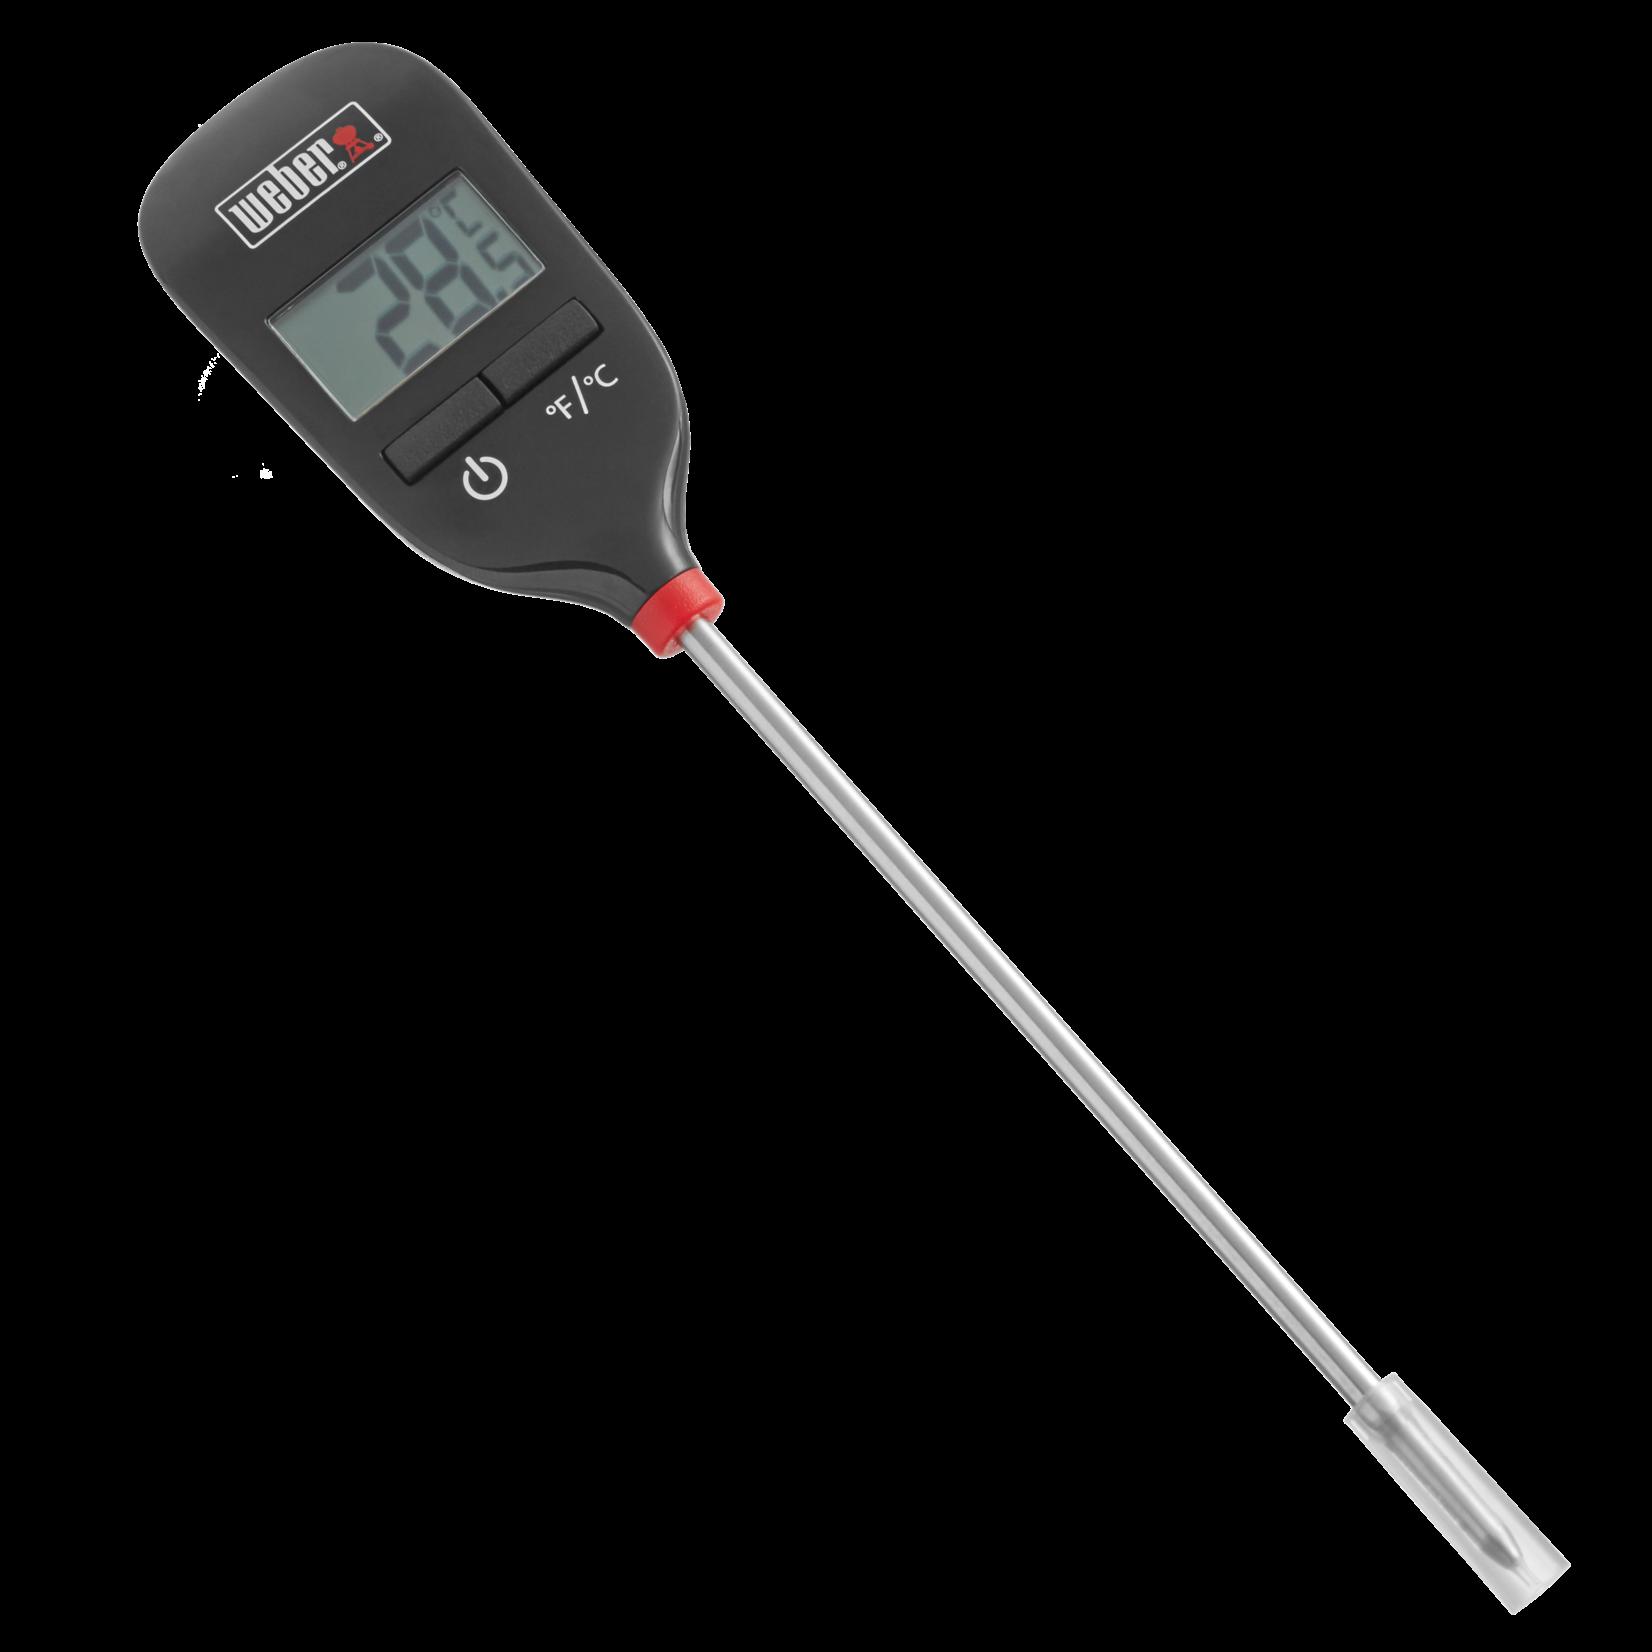 Weber Weber® digitale thermometer